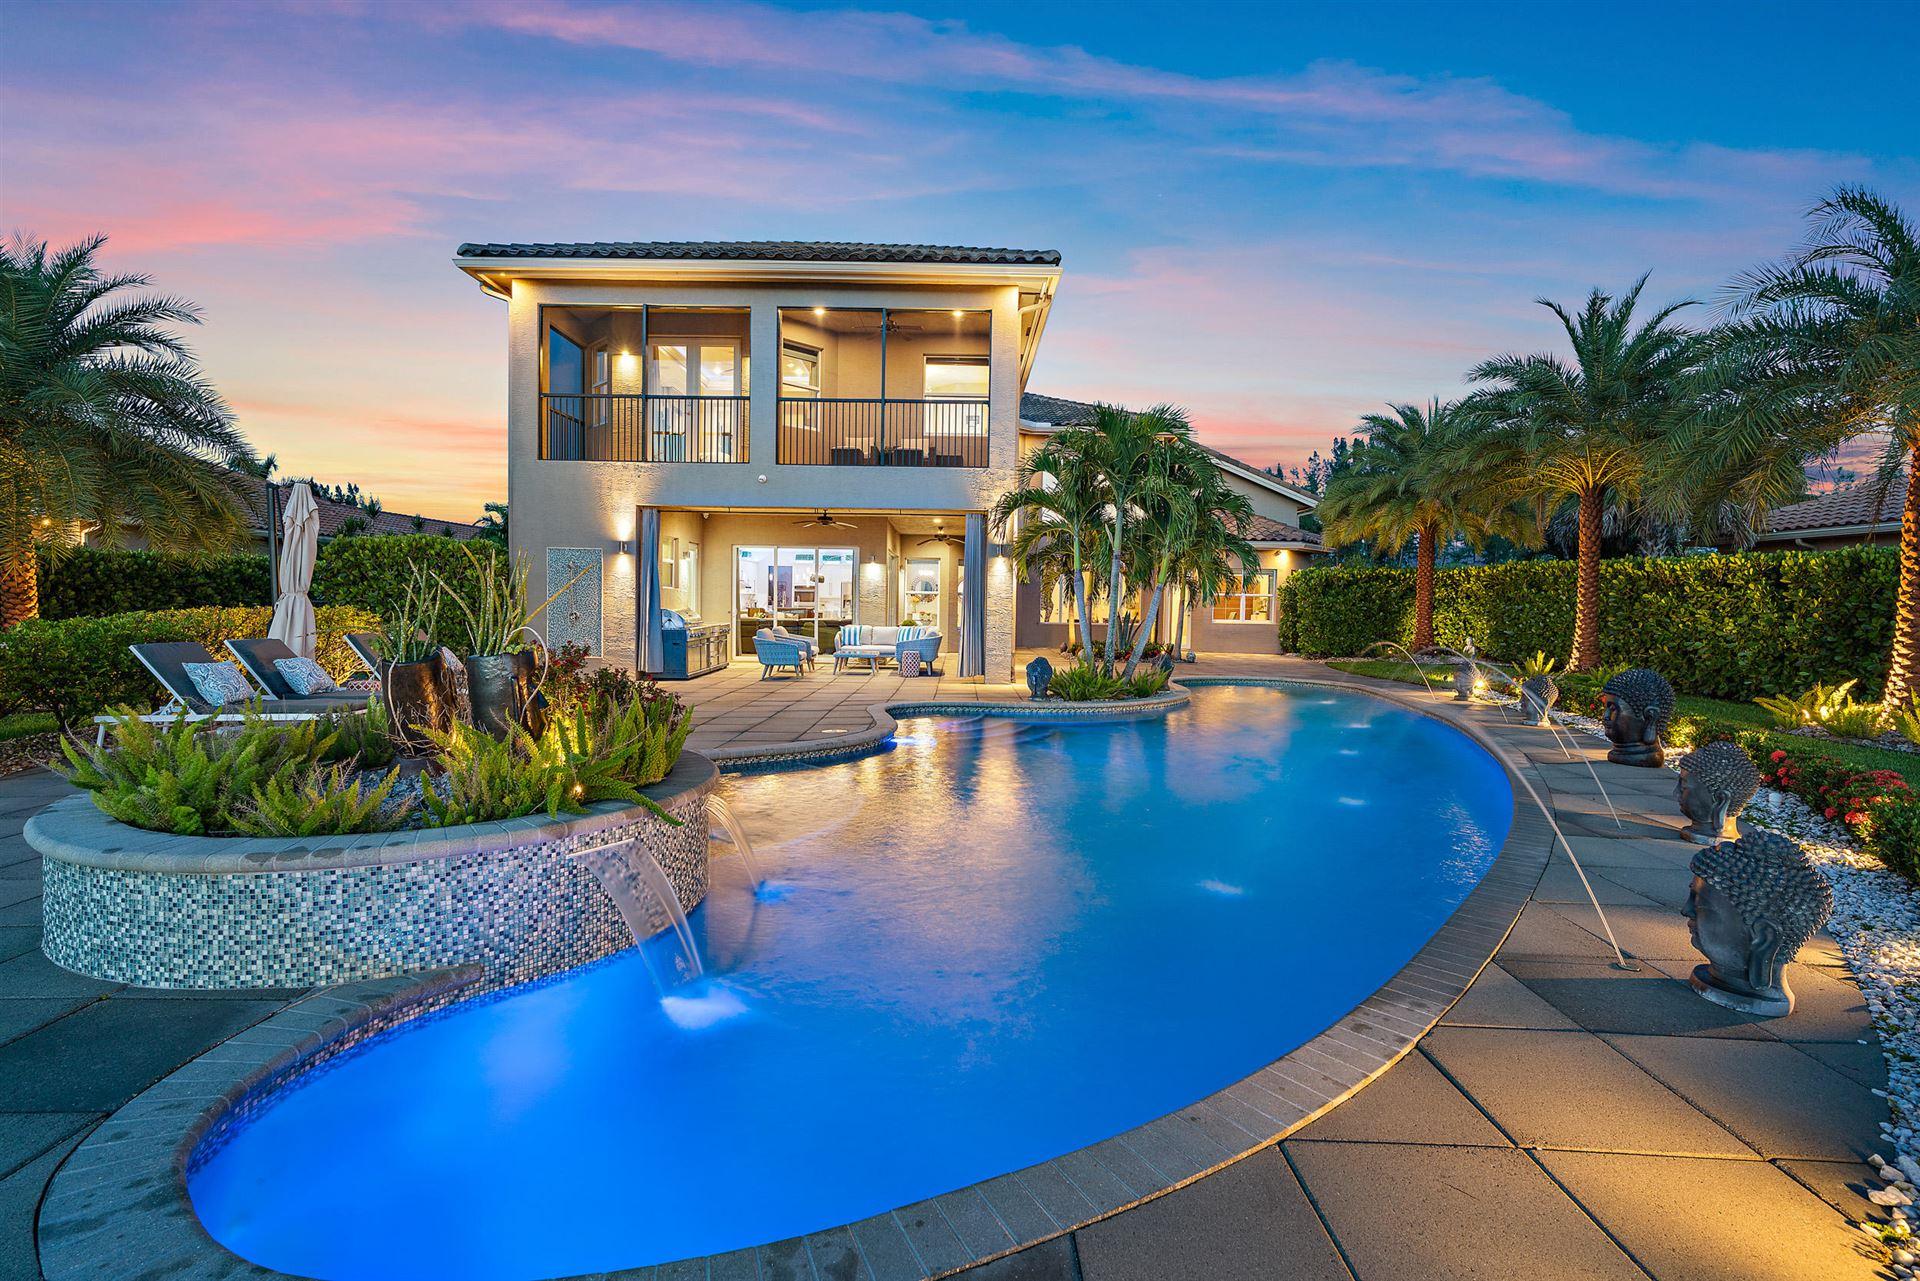 7643 Maywood Crest Drive, Palm Beach Gardens, FL 33412 - MLS#: RX-10648745